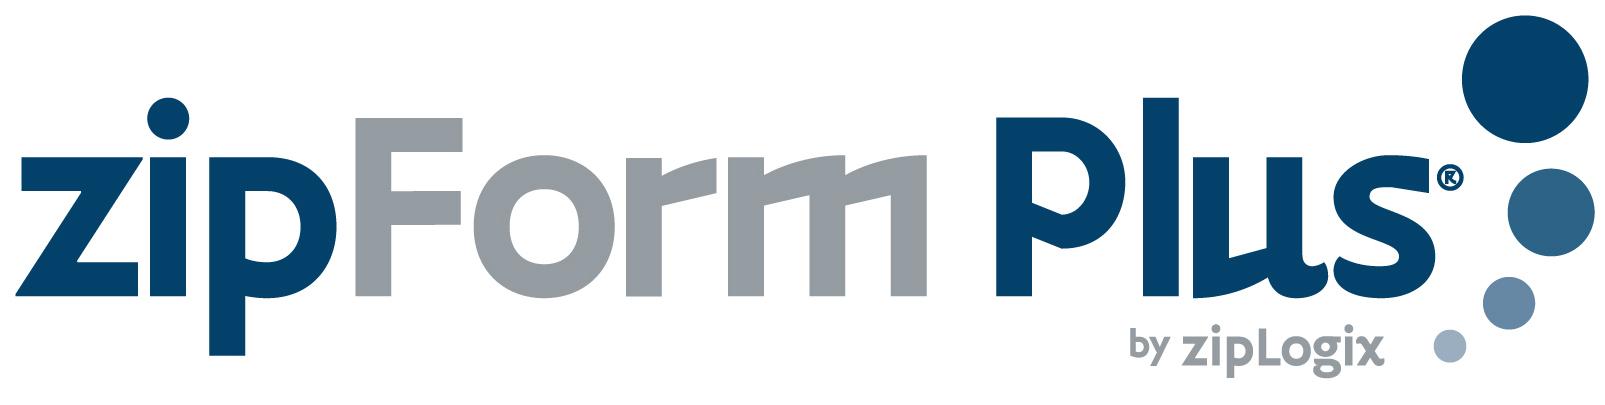 zipform® for non-members